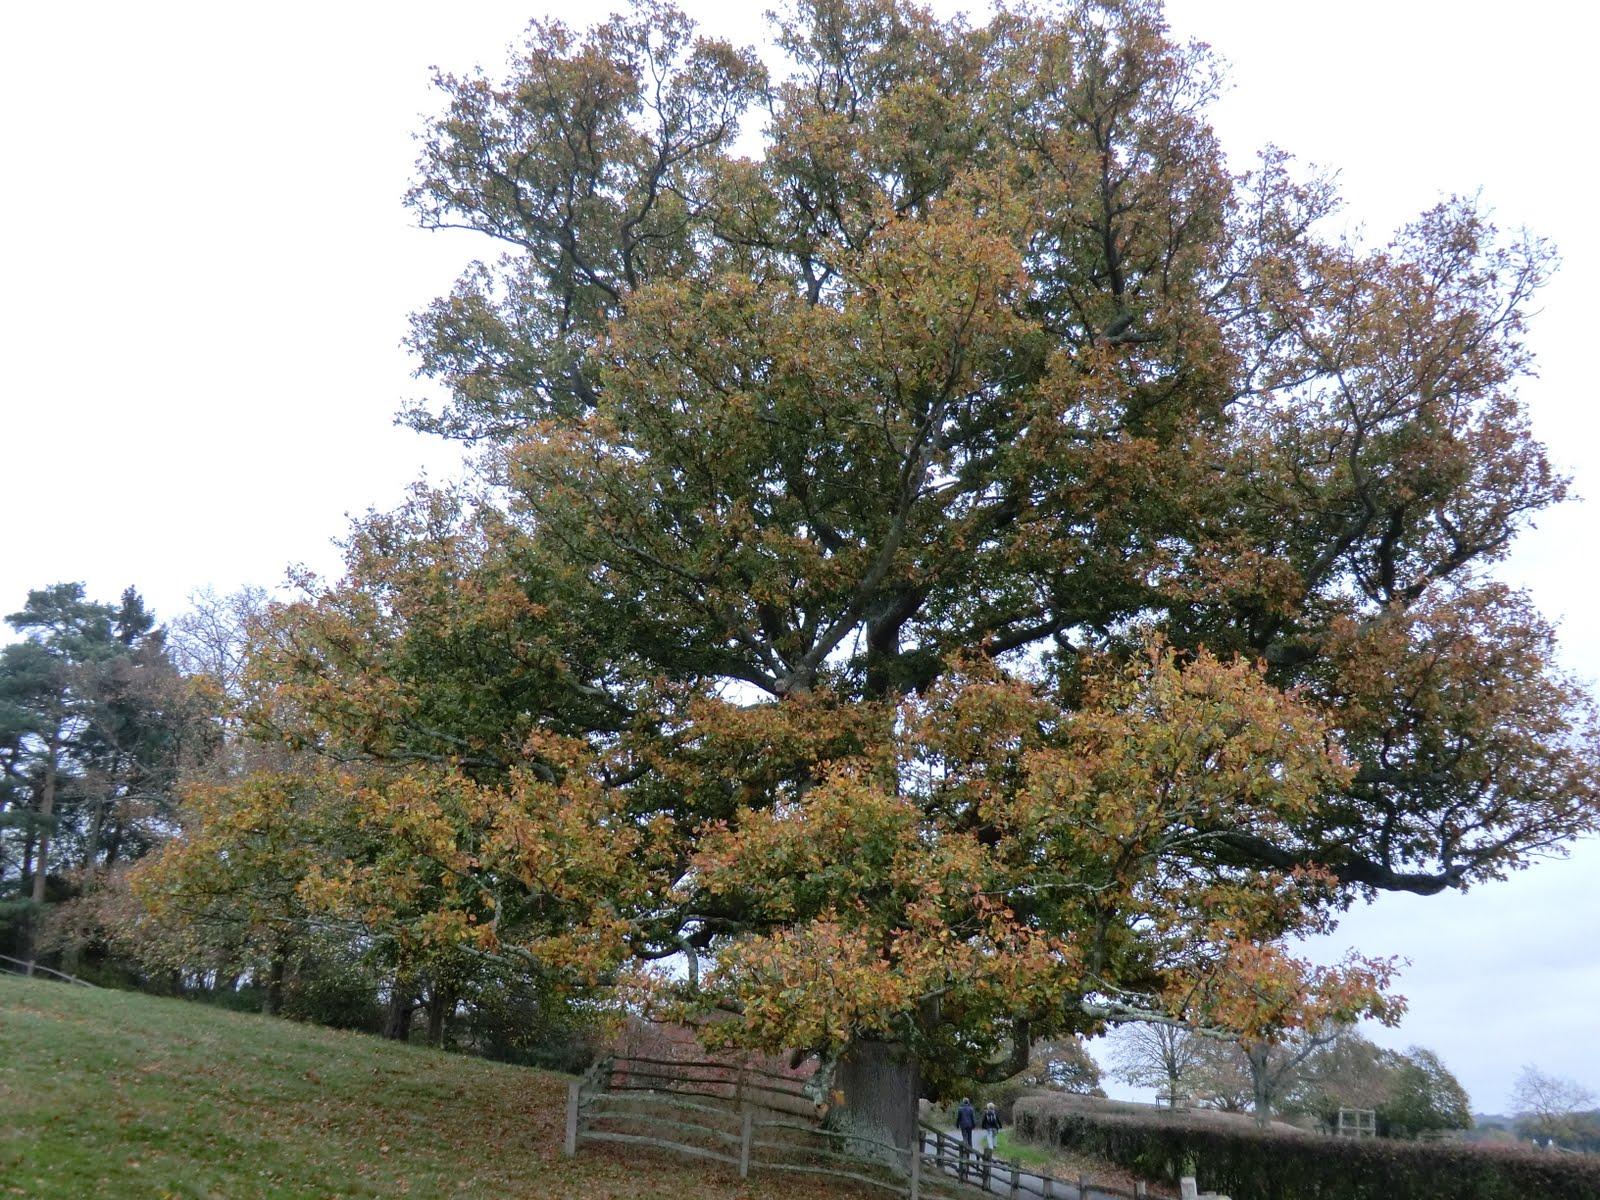 CIMG0236 Old oak tree outside Bateman's